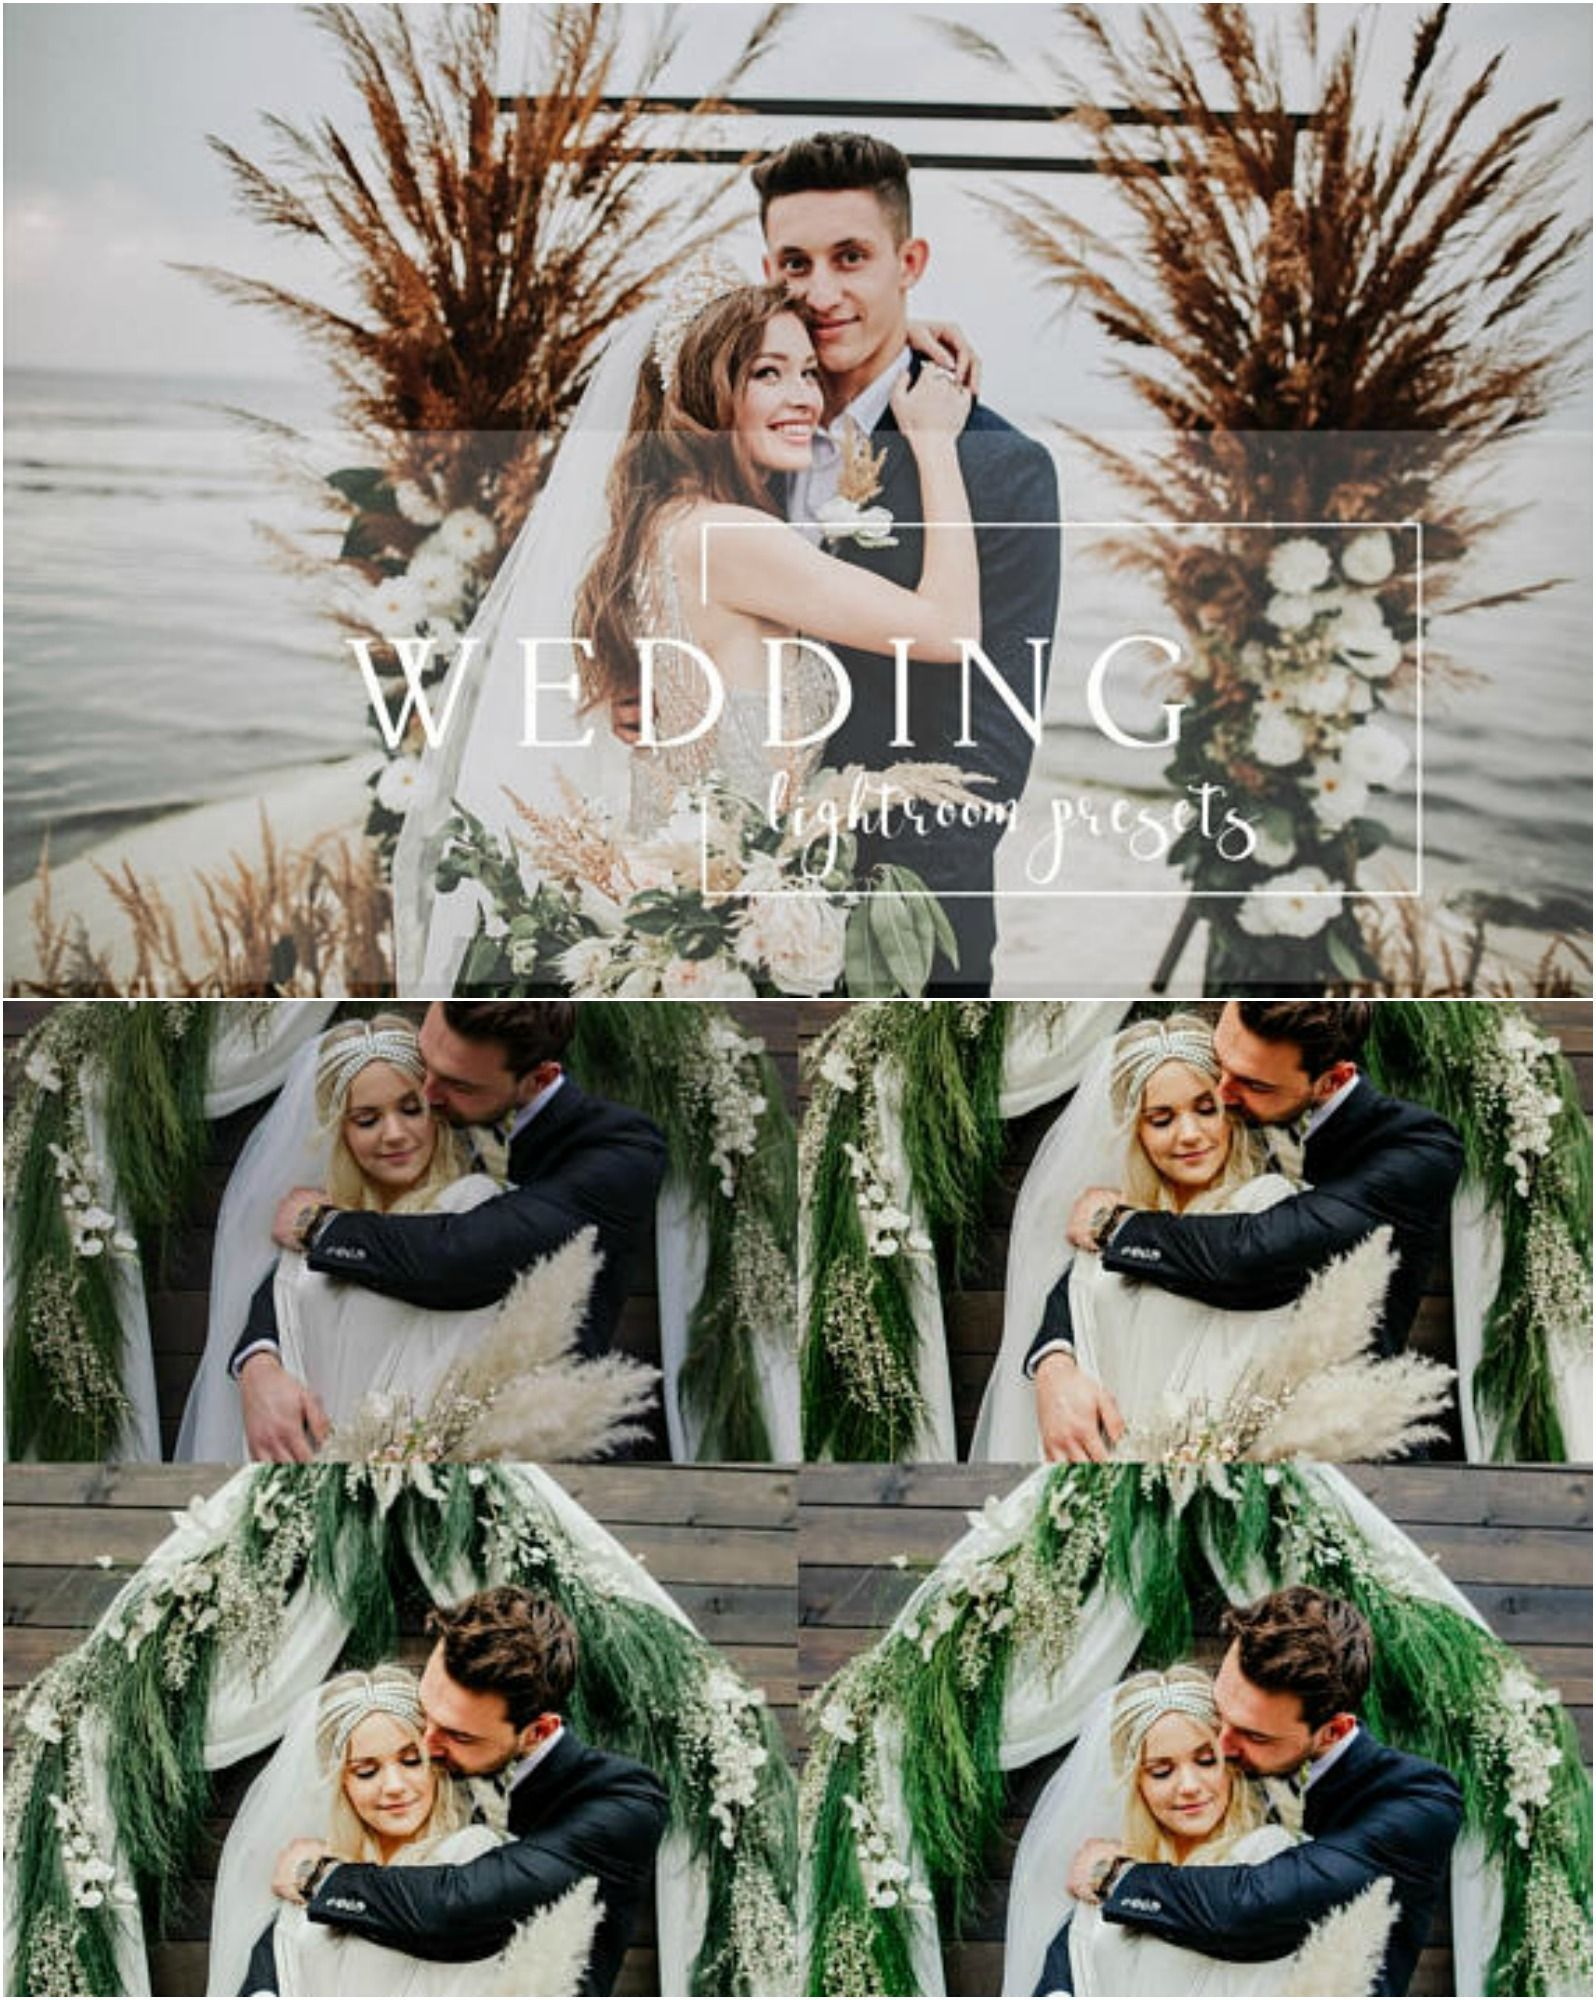 300 Wedding Lightroom Presets Lightroom Wedding Presets Lightroom Presets Wedding Presets For Lightroom Lightroom Ad Editing Presets